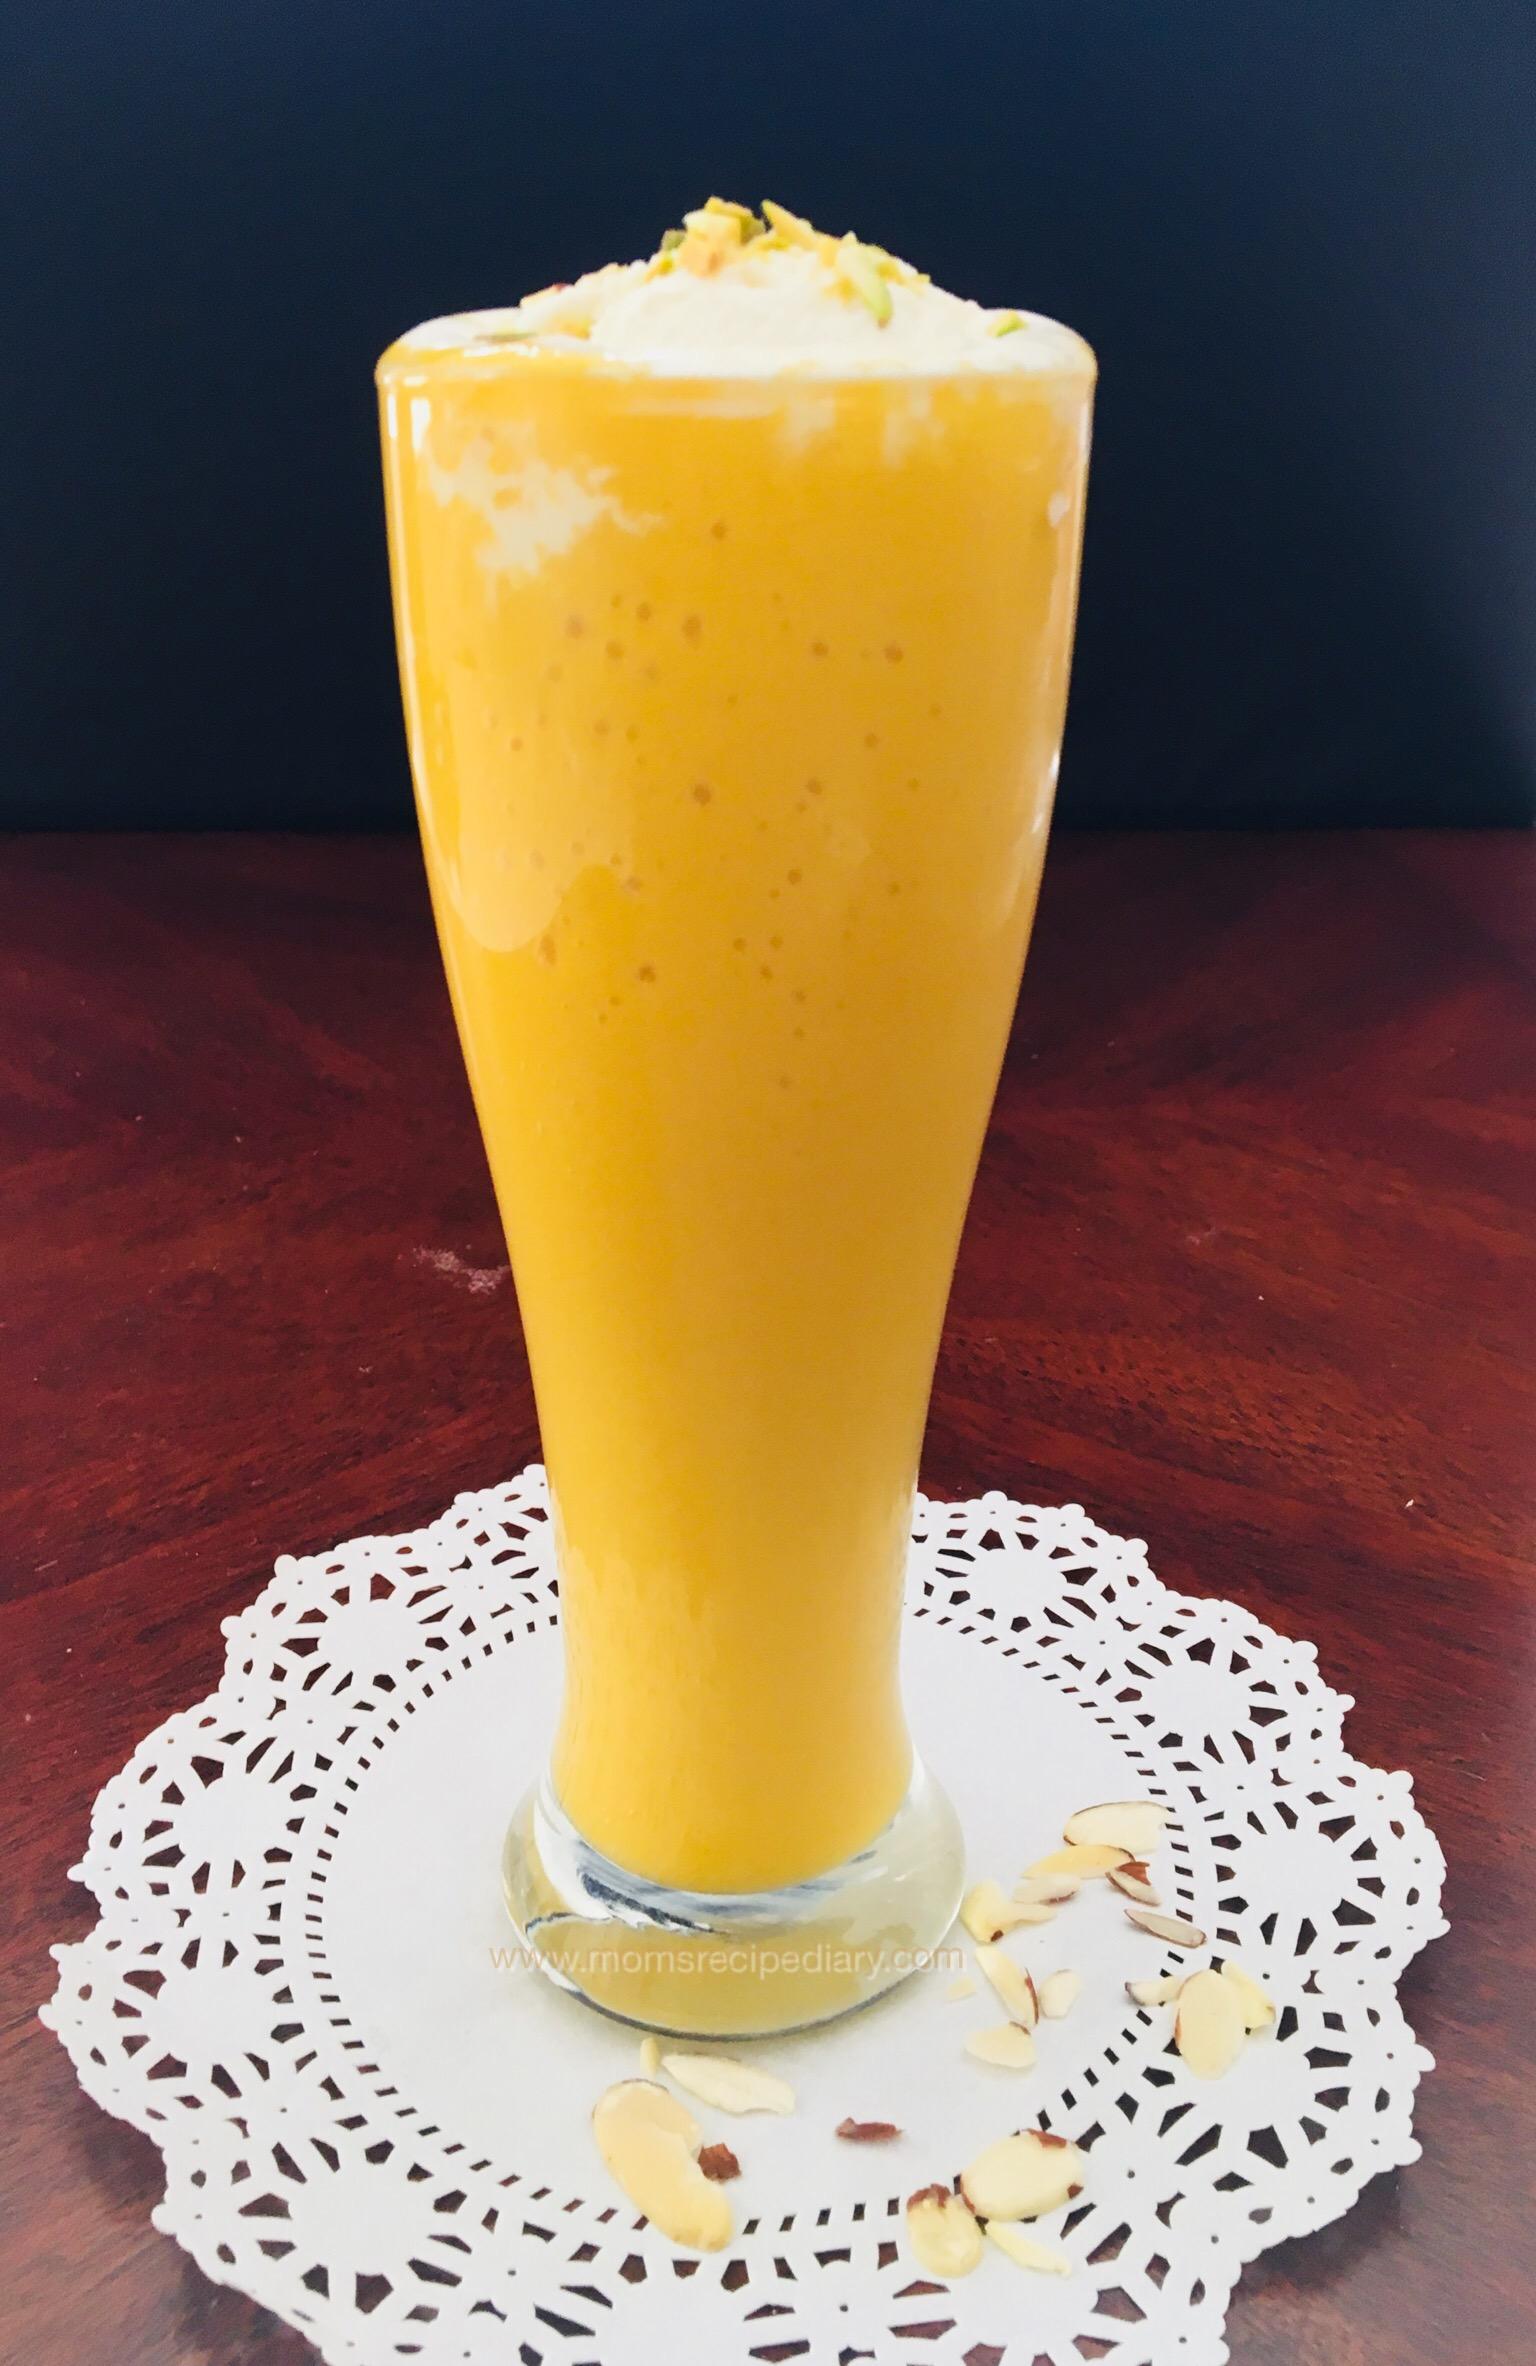 How to make a mango smoothie with vanilla ice cream